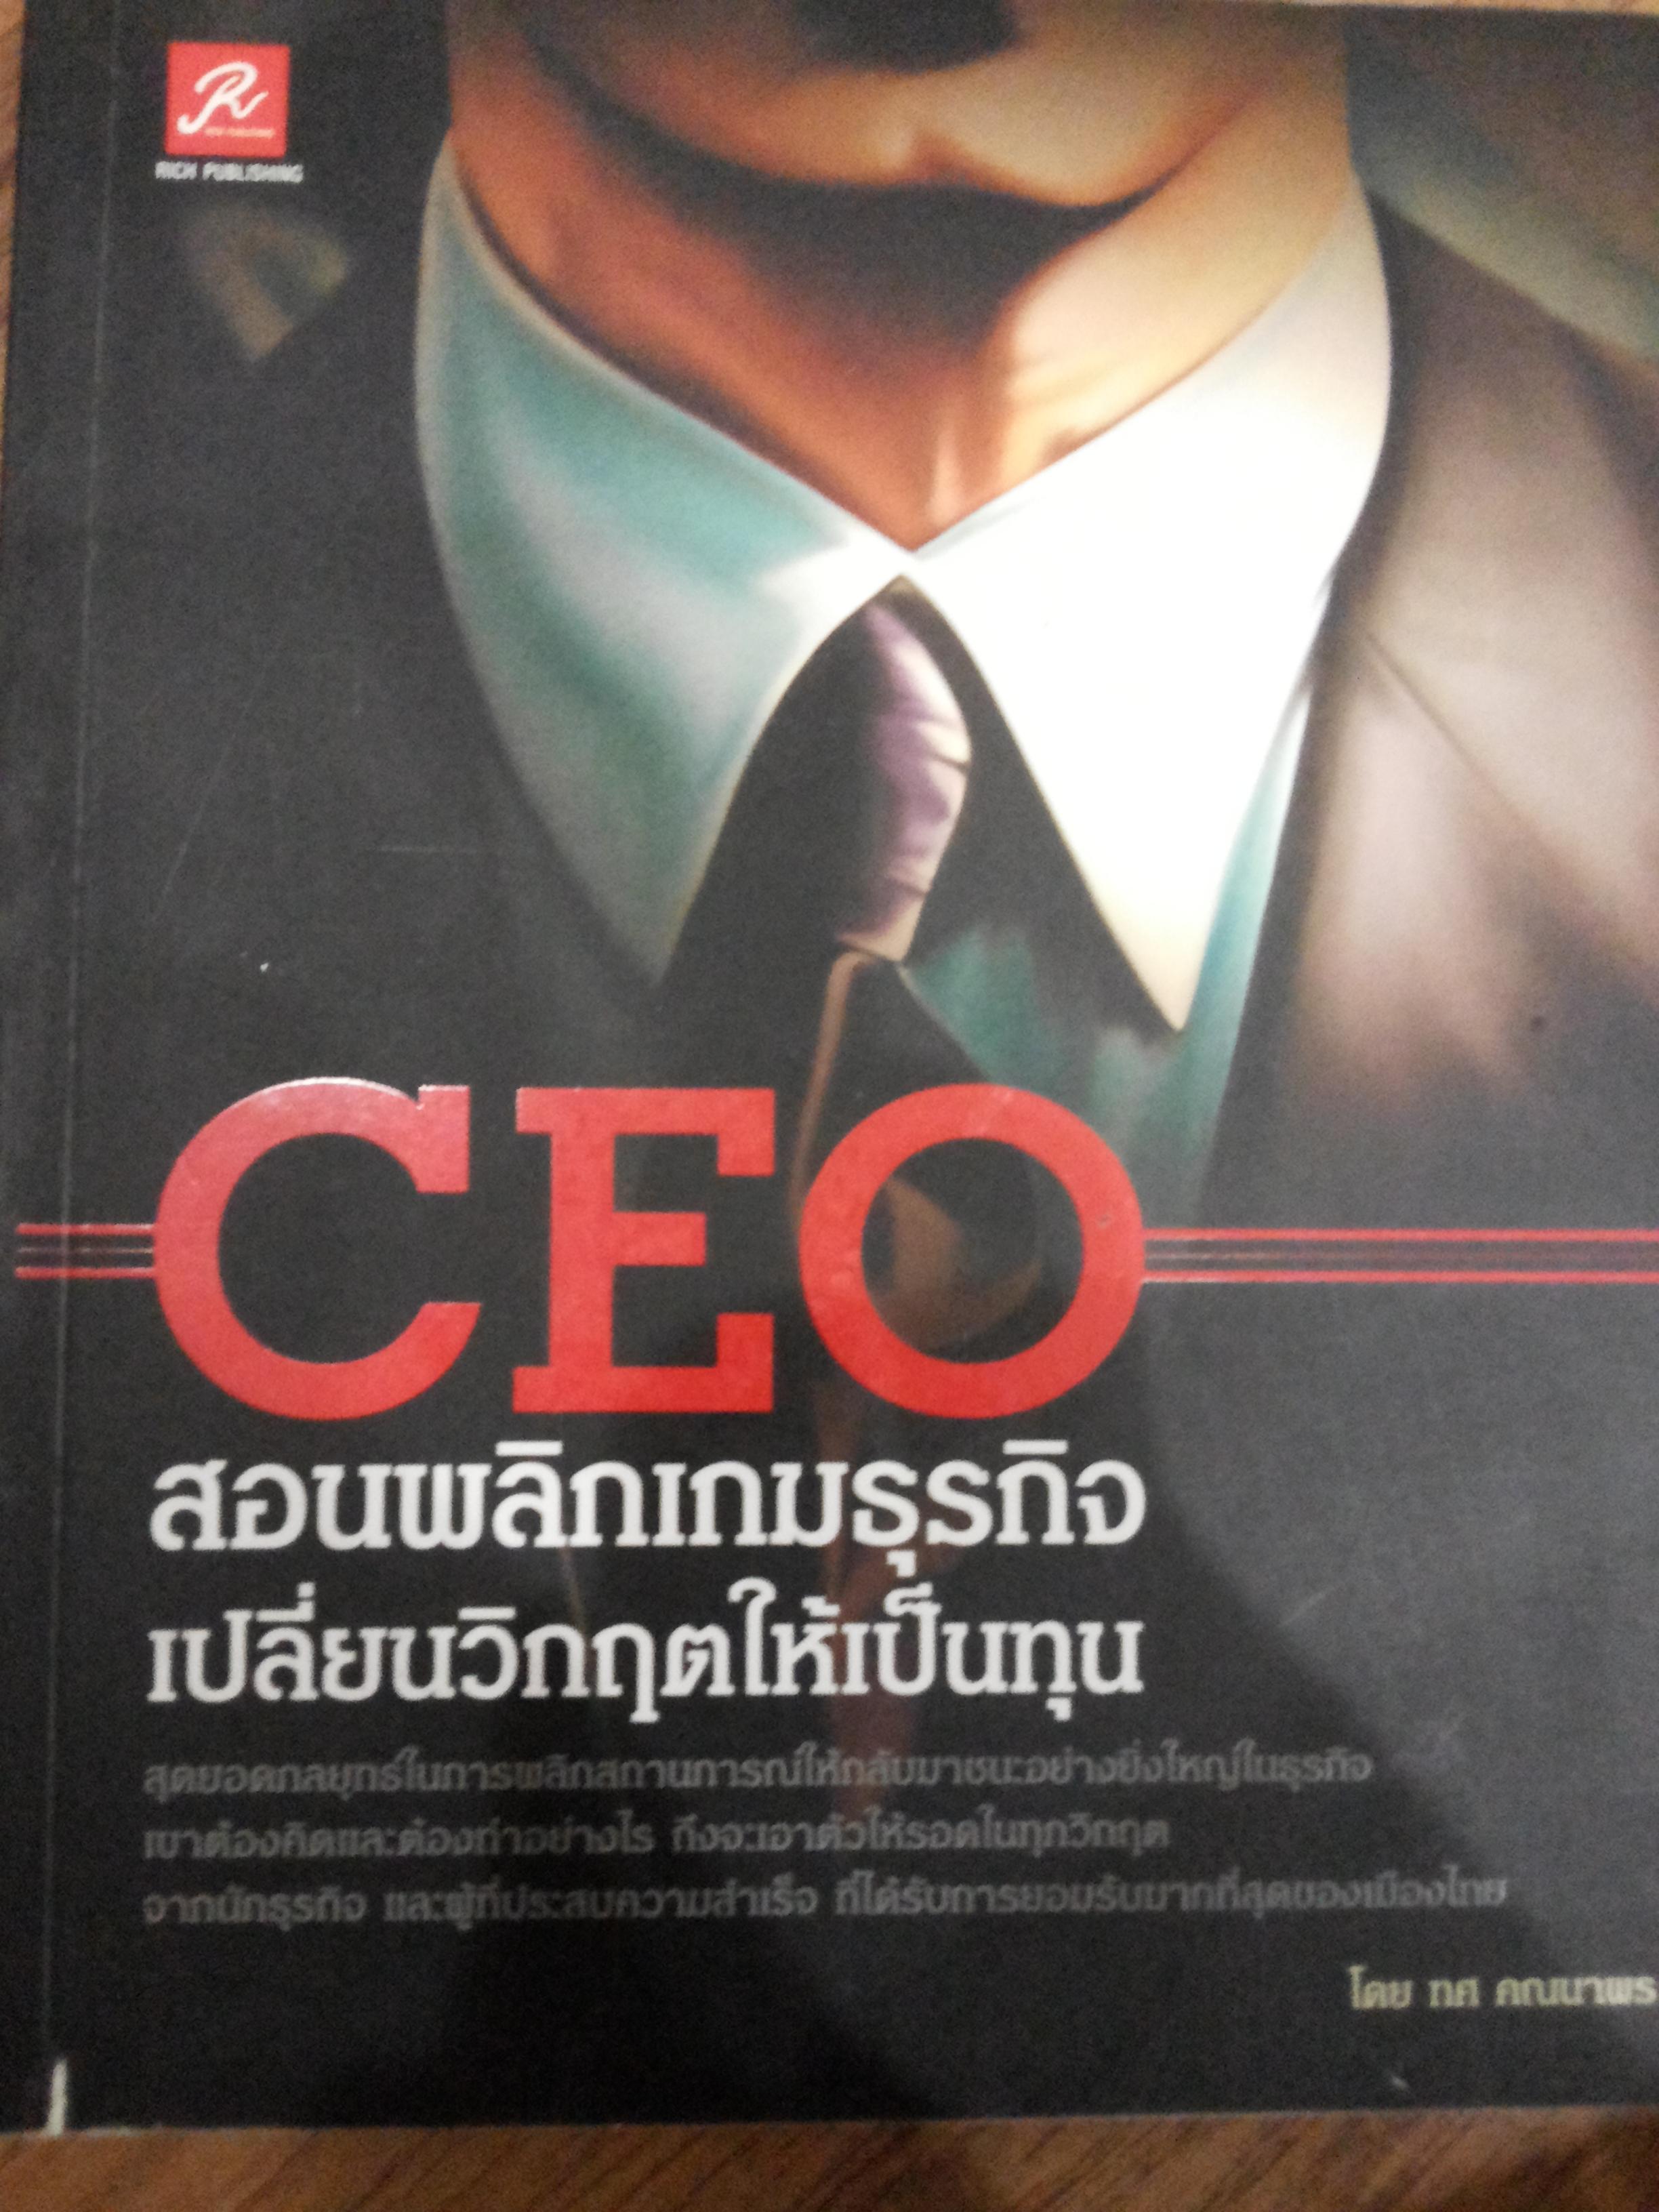 CEO สอนพลิกเกมธุรกิจ